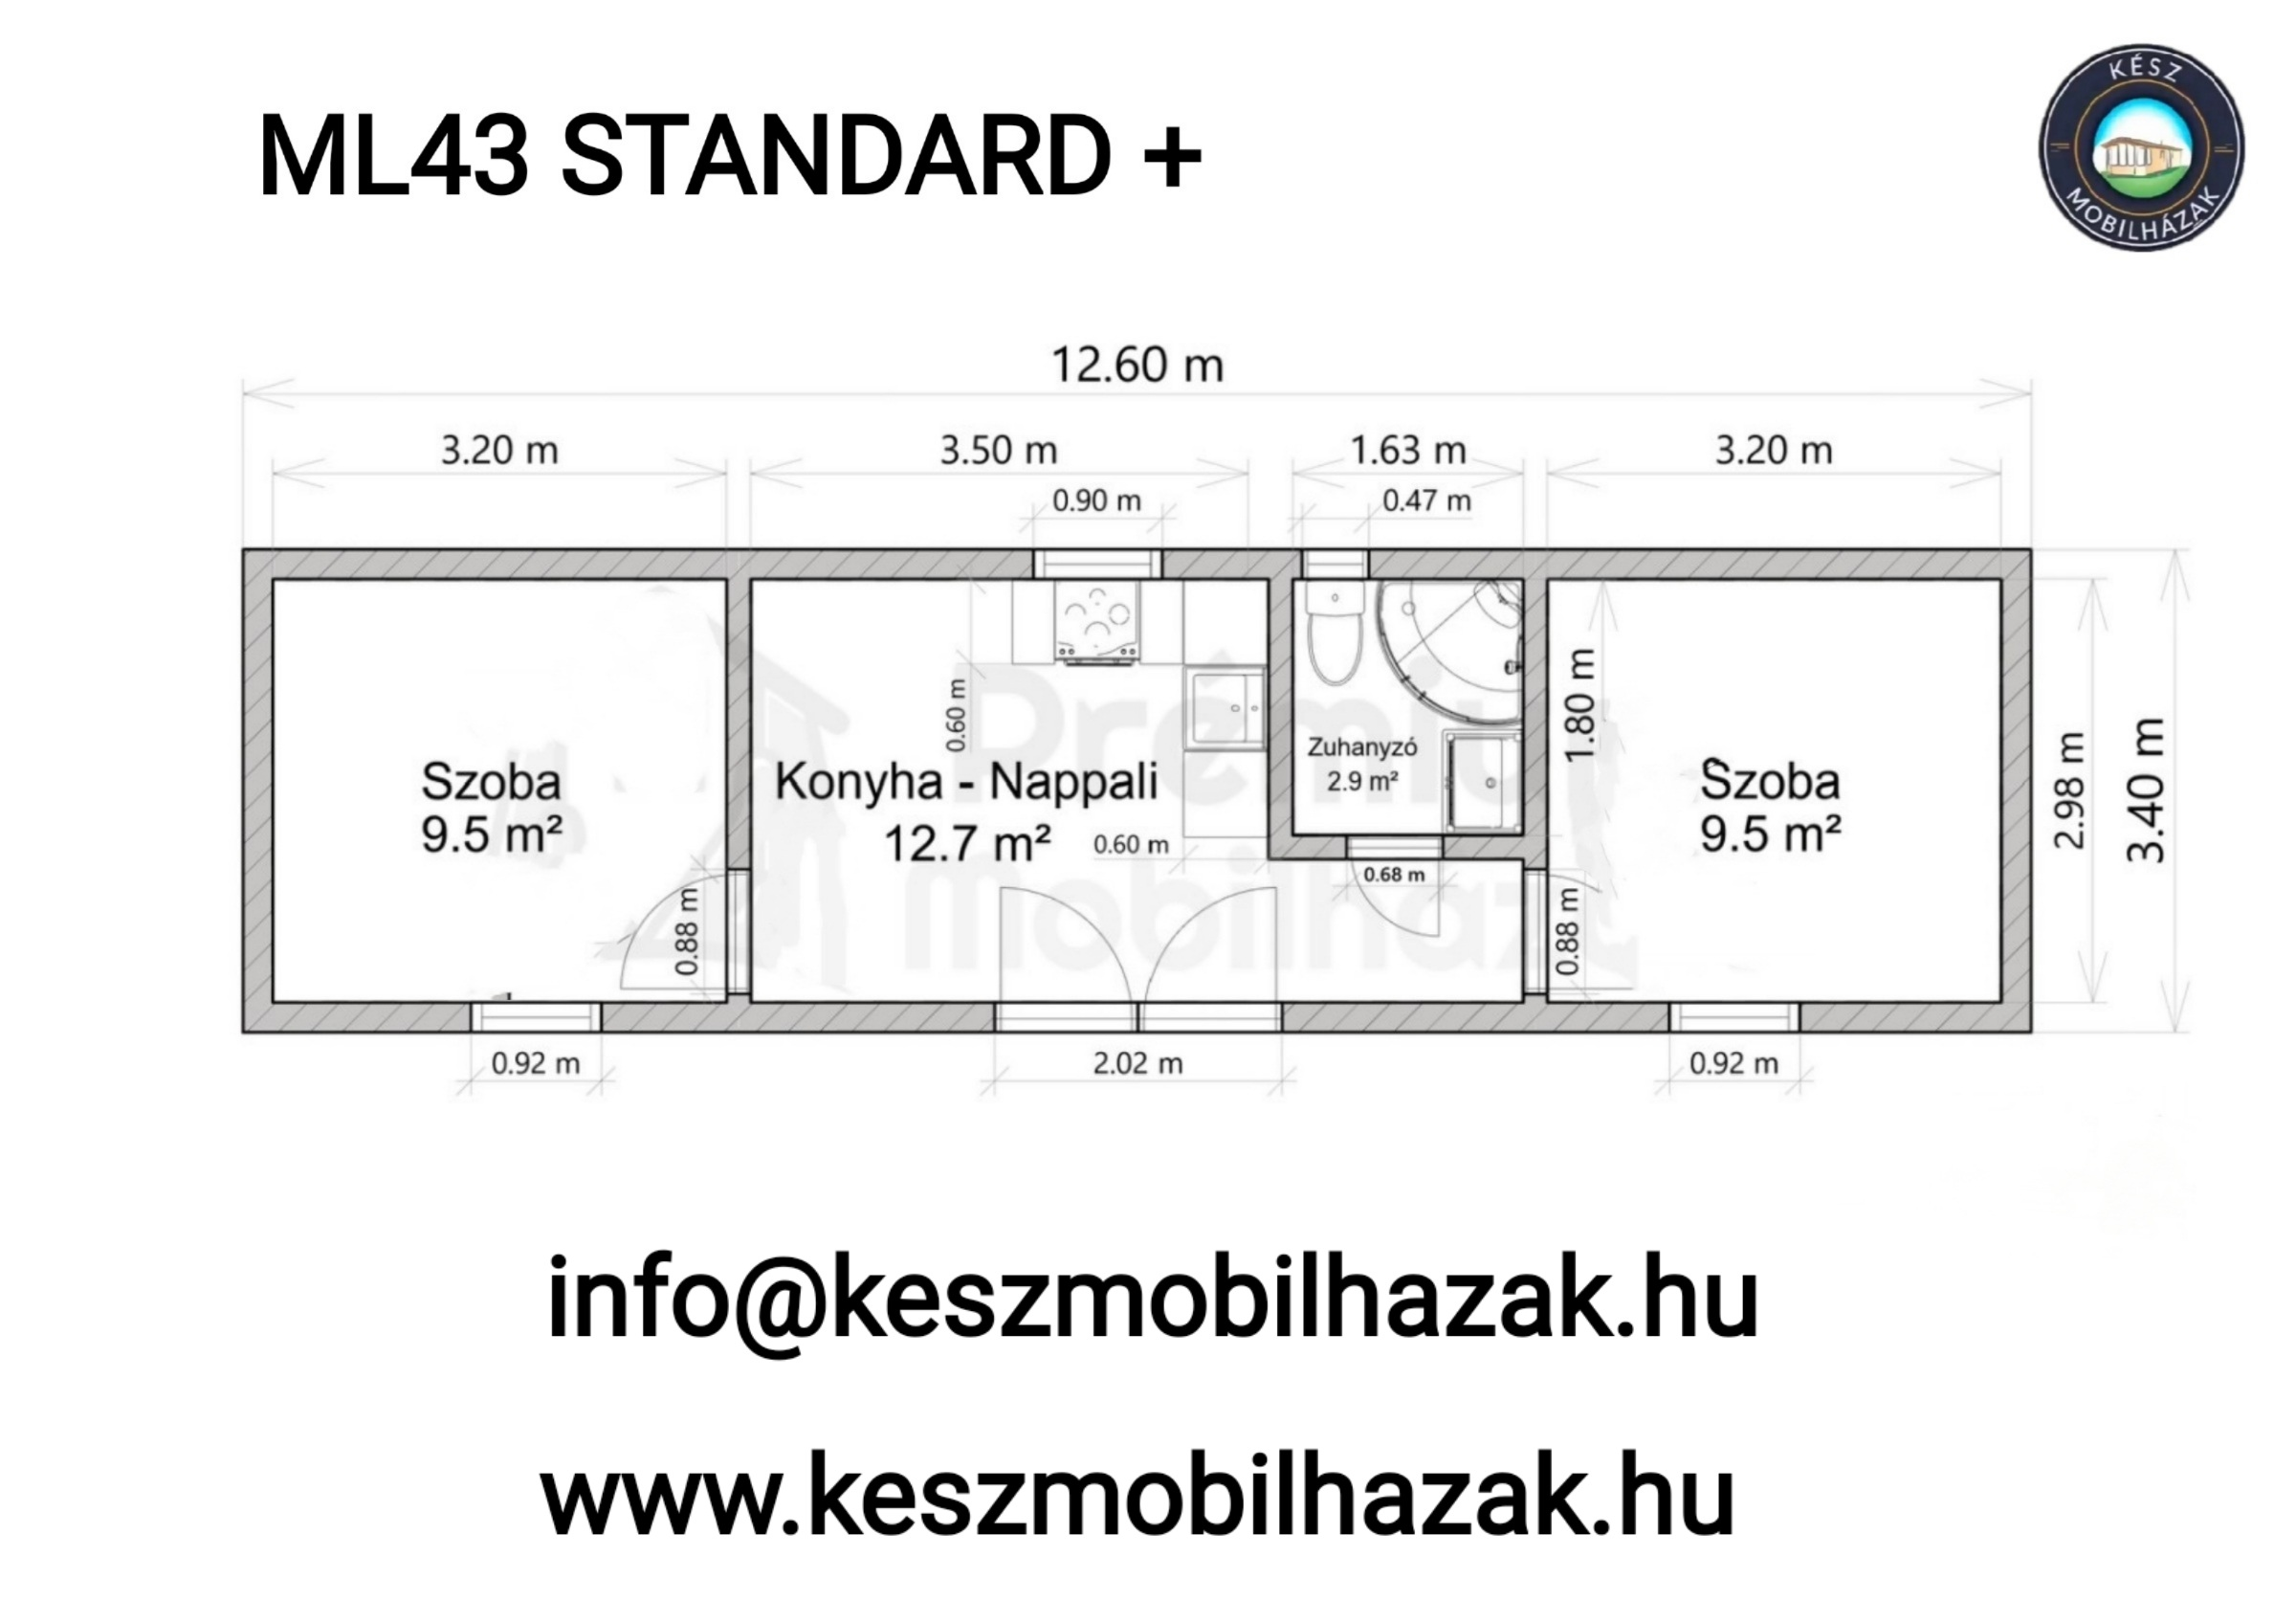 ML43 STANDARD+